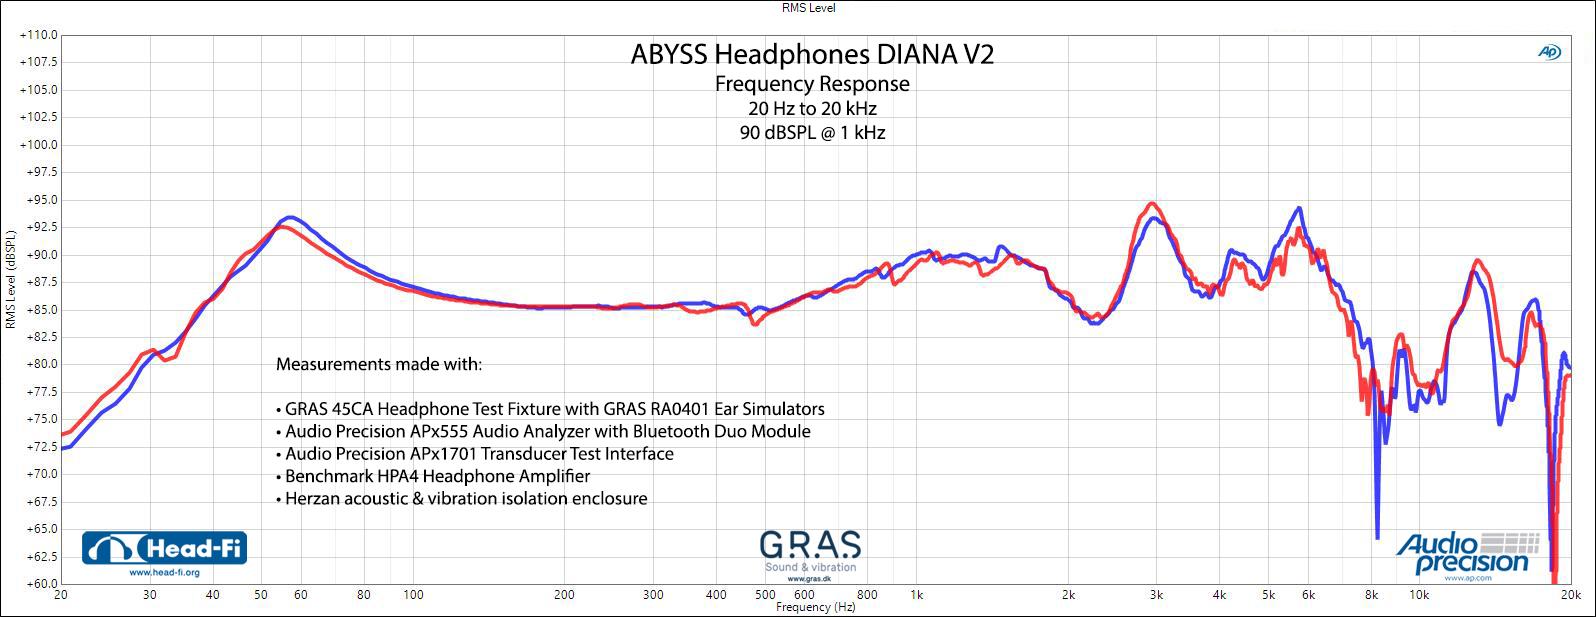 Abyss-Headphones-Diana-V2---SEAT-01-45CA---FR---90-dBSPL-1-kHz.jpg